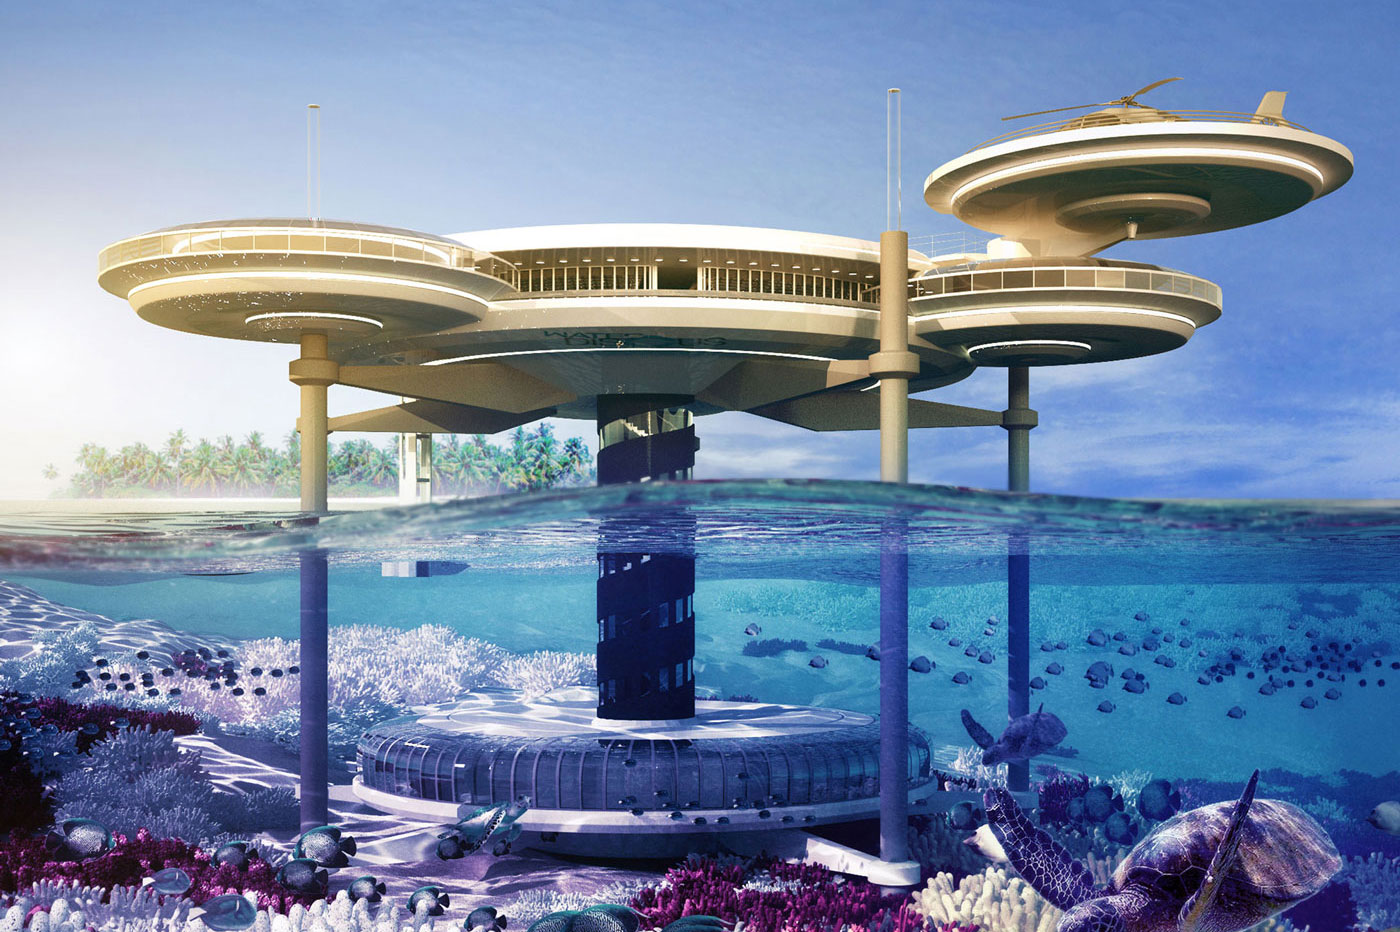 hotel-sous-marin-luxe-insolite-dubai